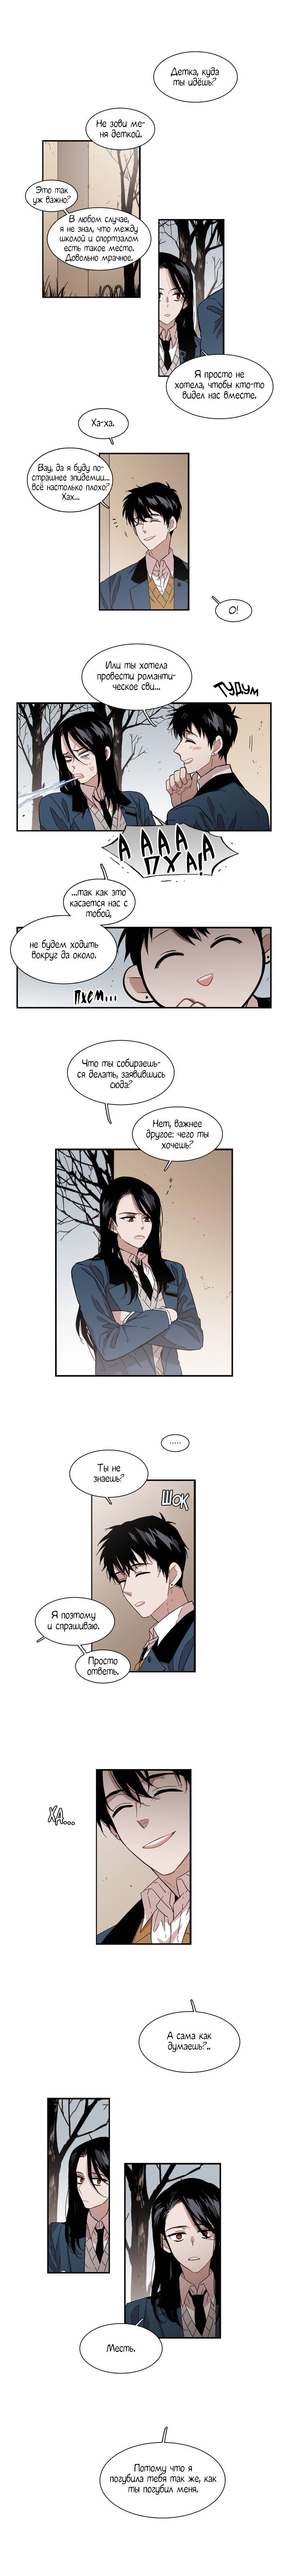 https://r2.ninemanga.com/comics/pic3/24/19800/1318085/1551147105987.jpg Page 2